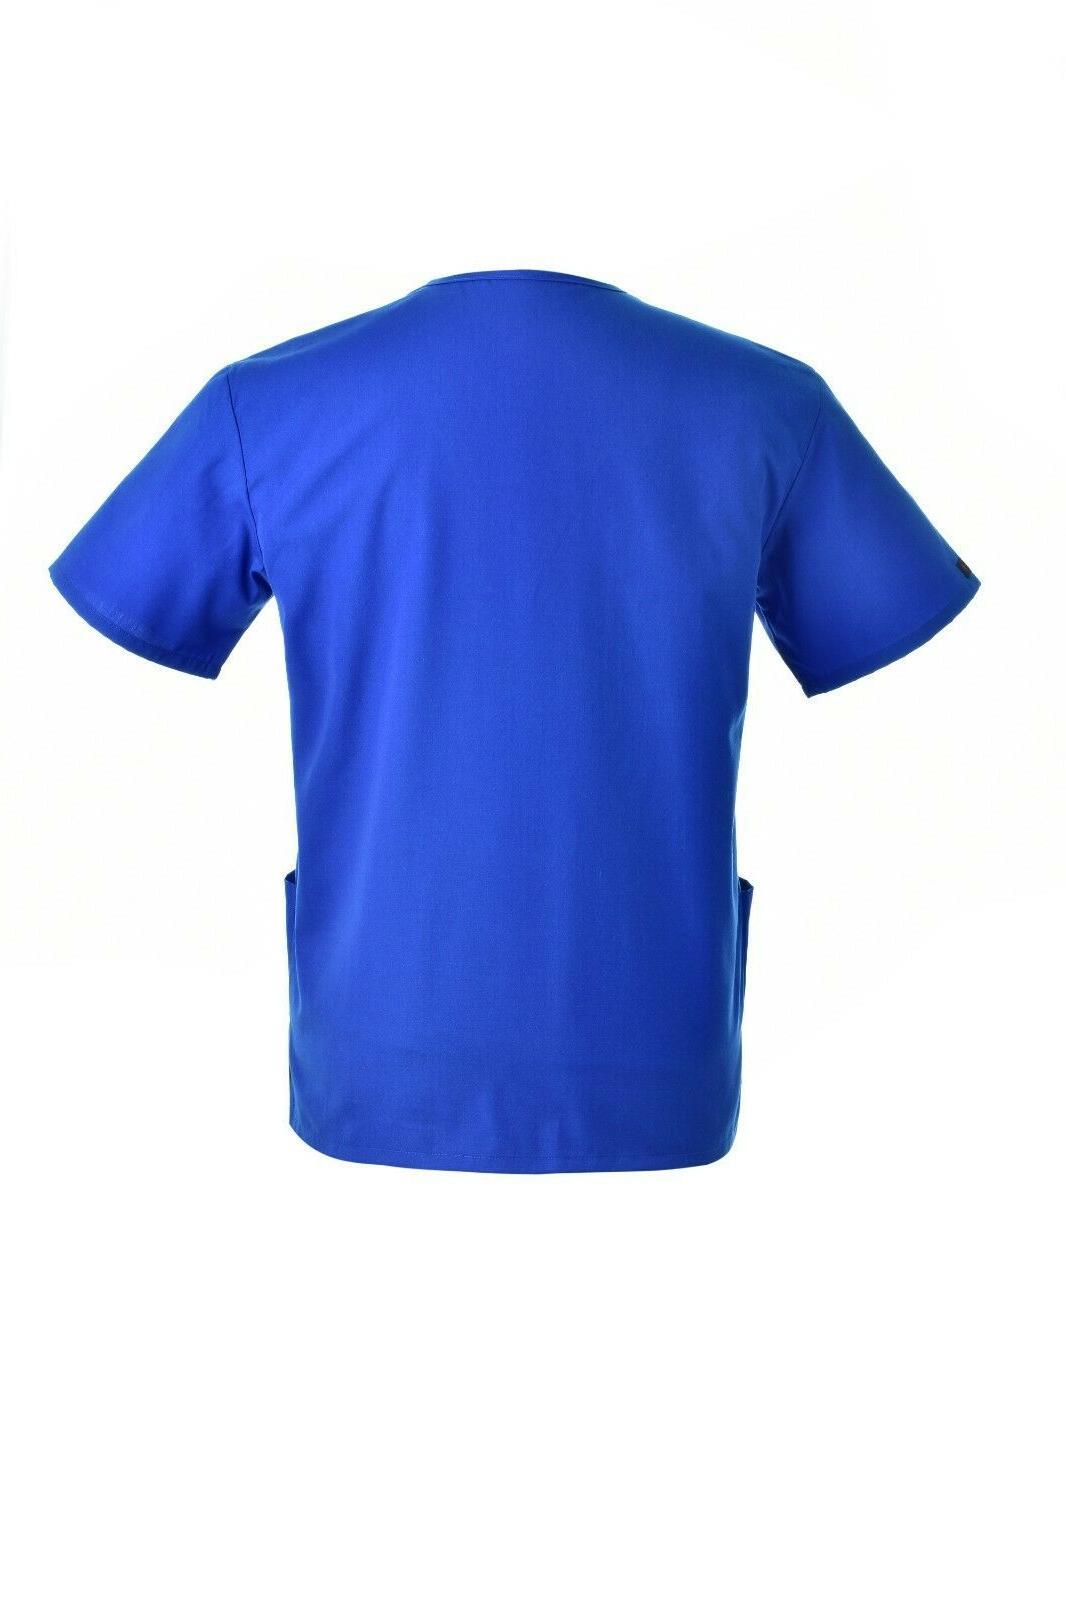 Unisex STRETCH Solid V-Neck Top Pant Men Nursing Uniform